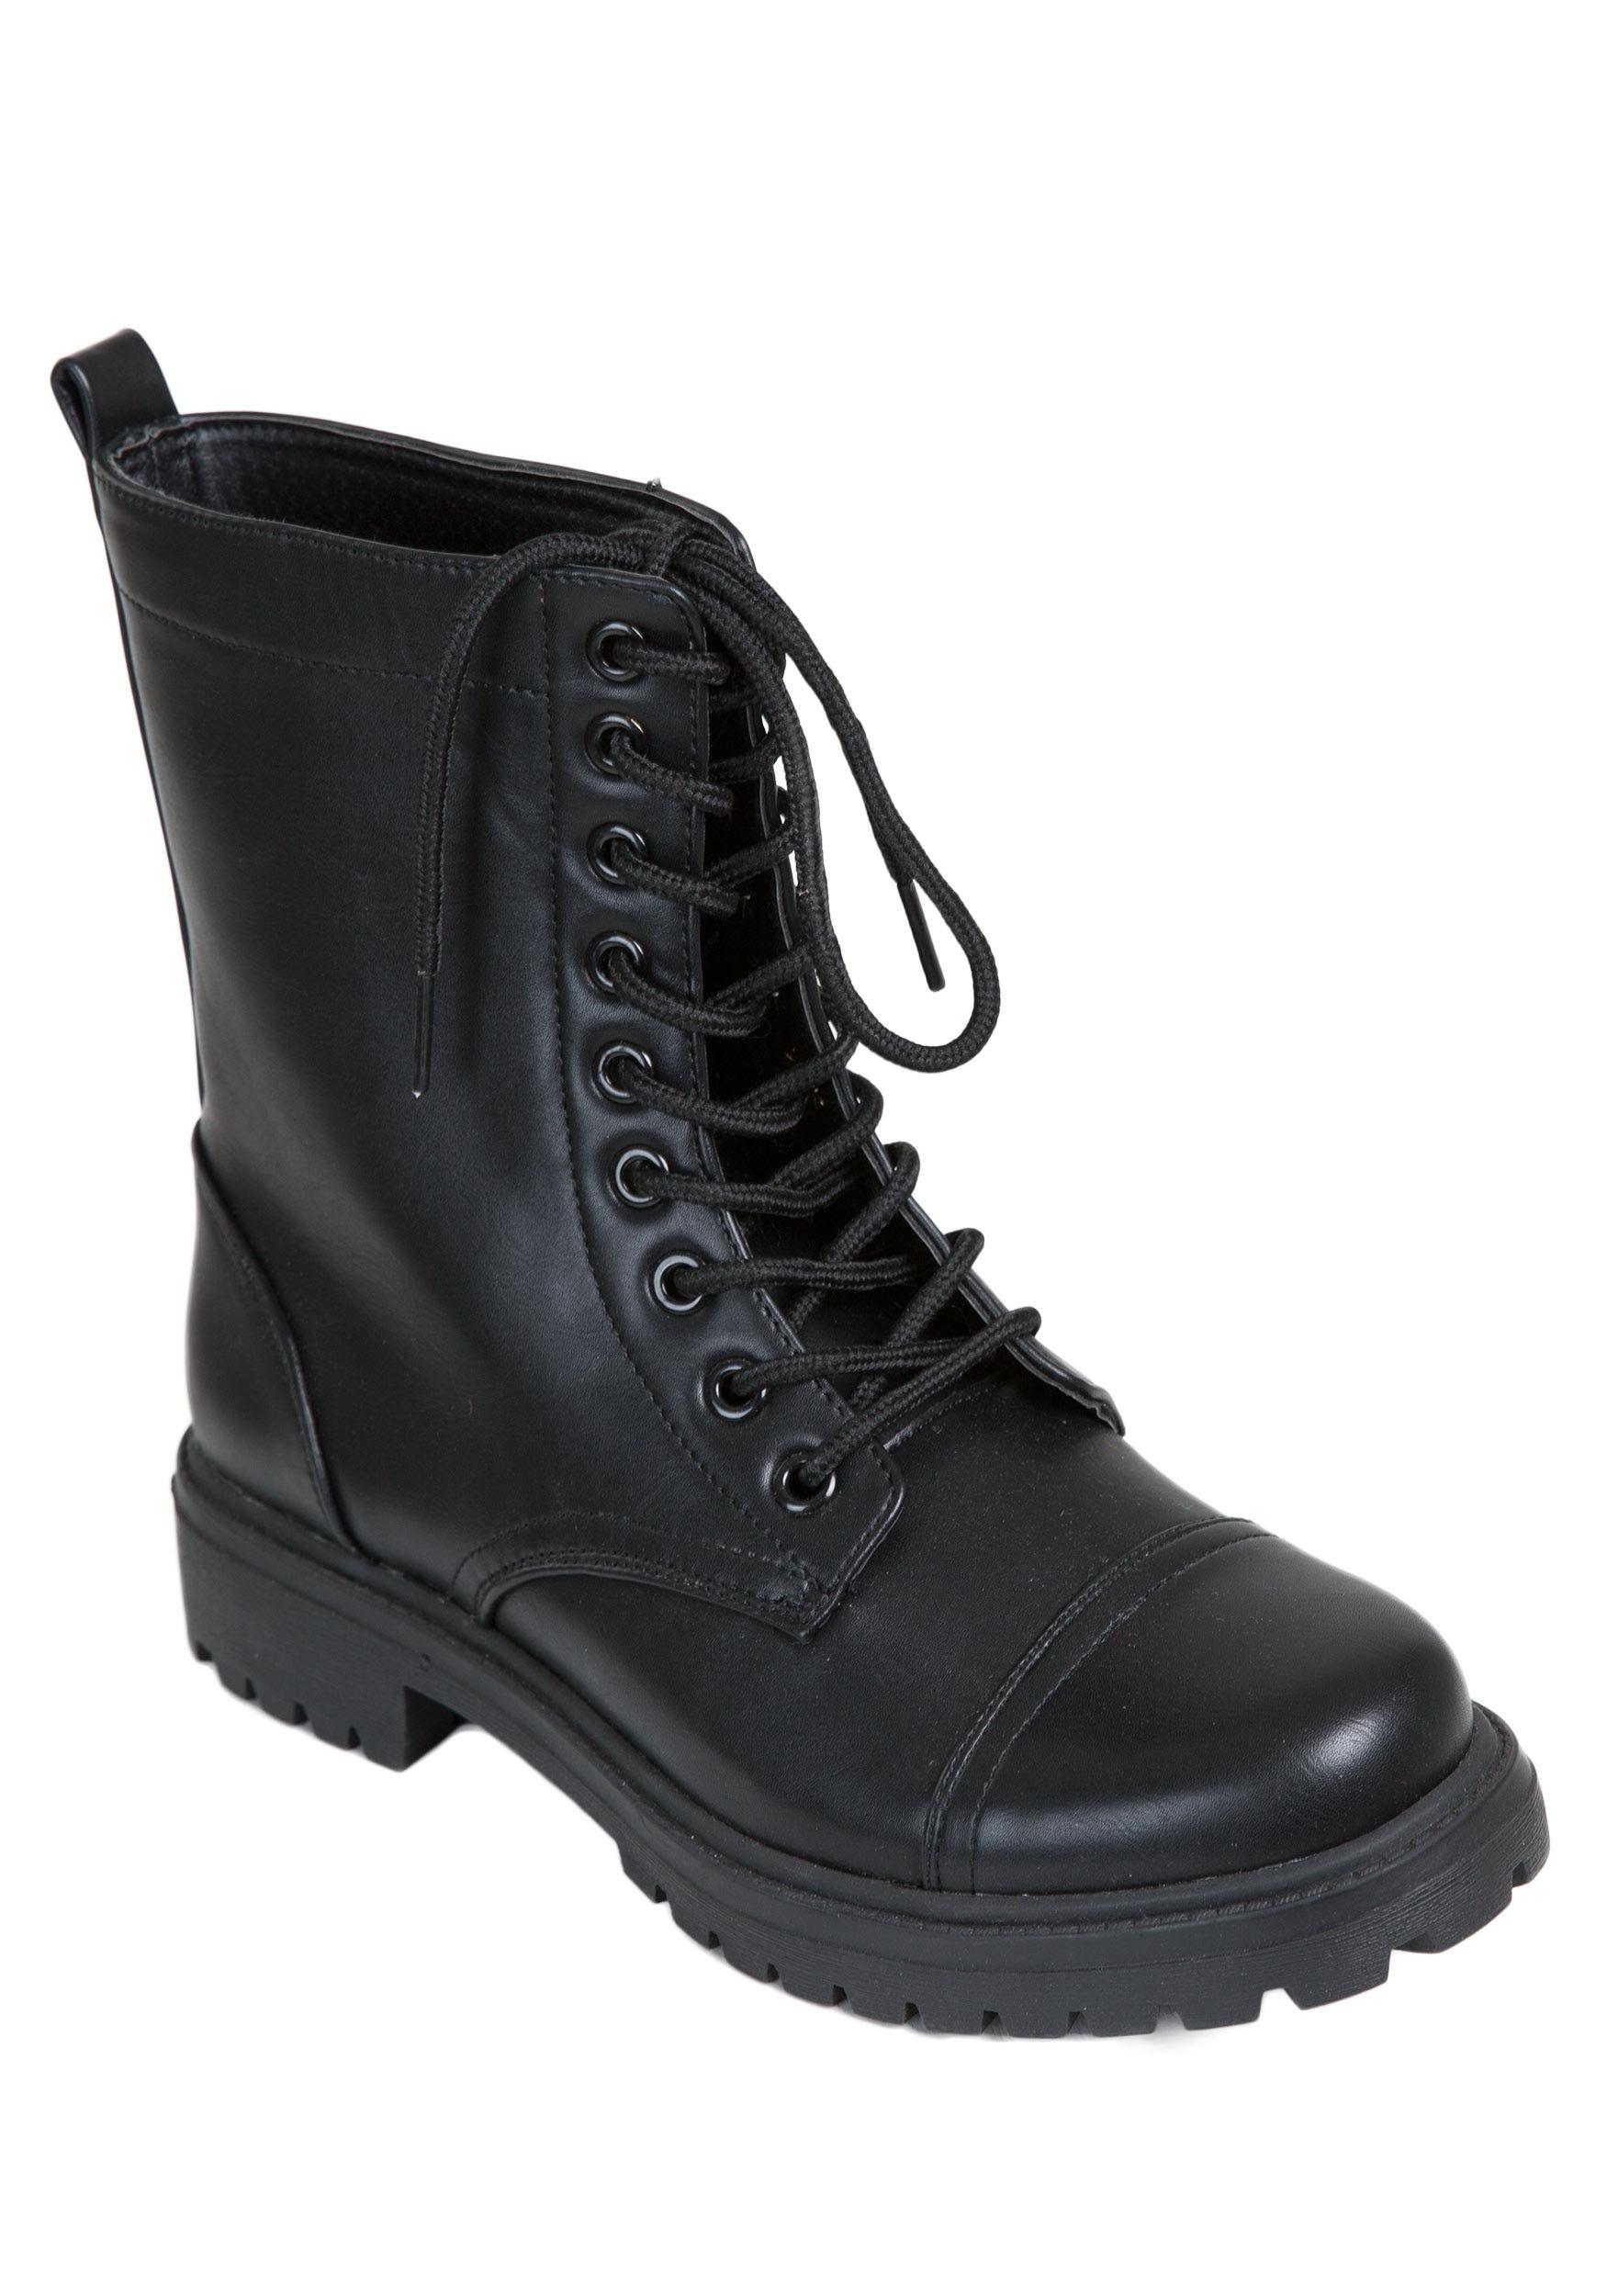 boots women womenu0027s combat boots NYNDWIU